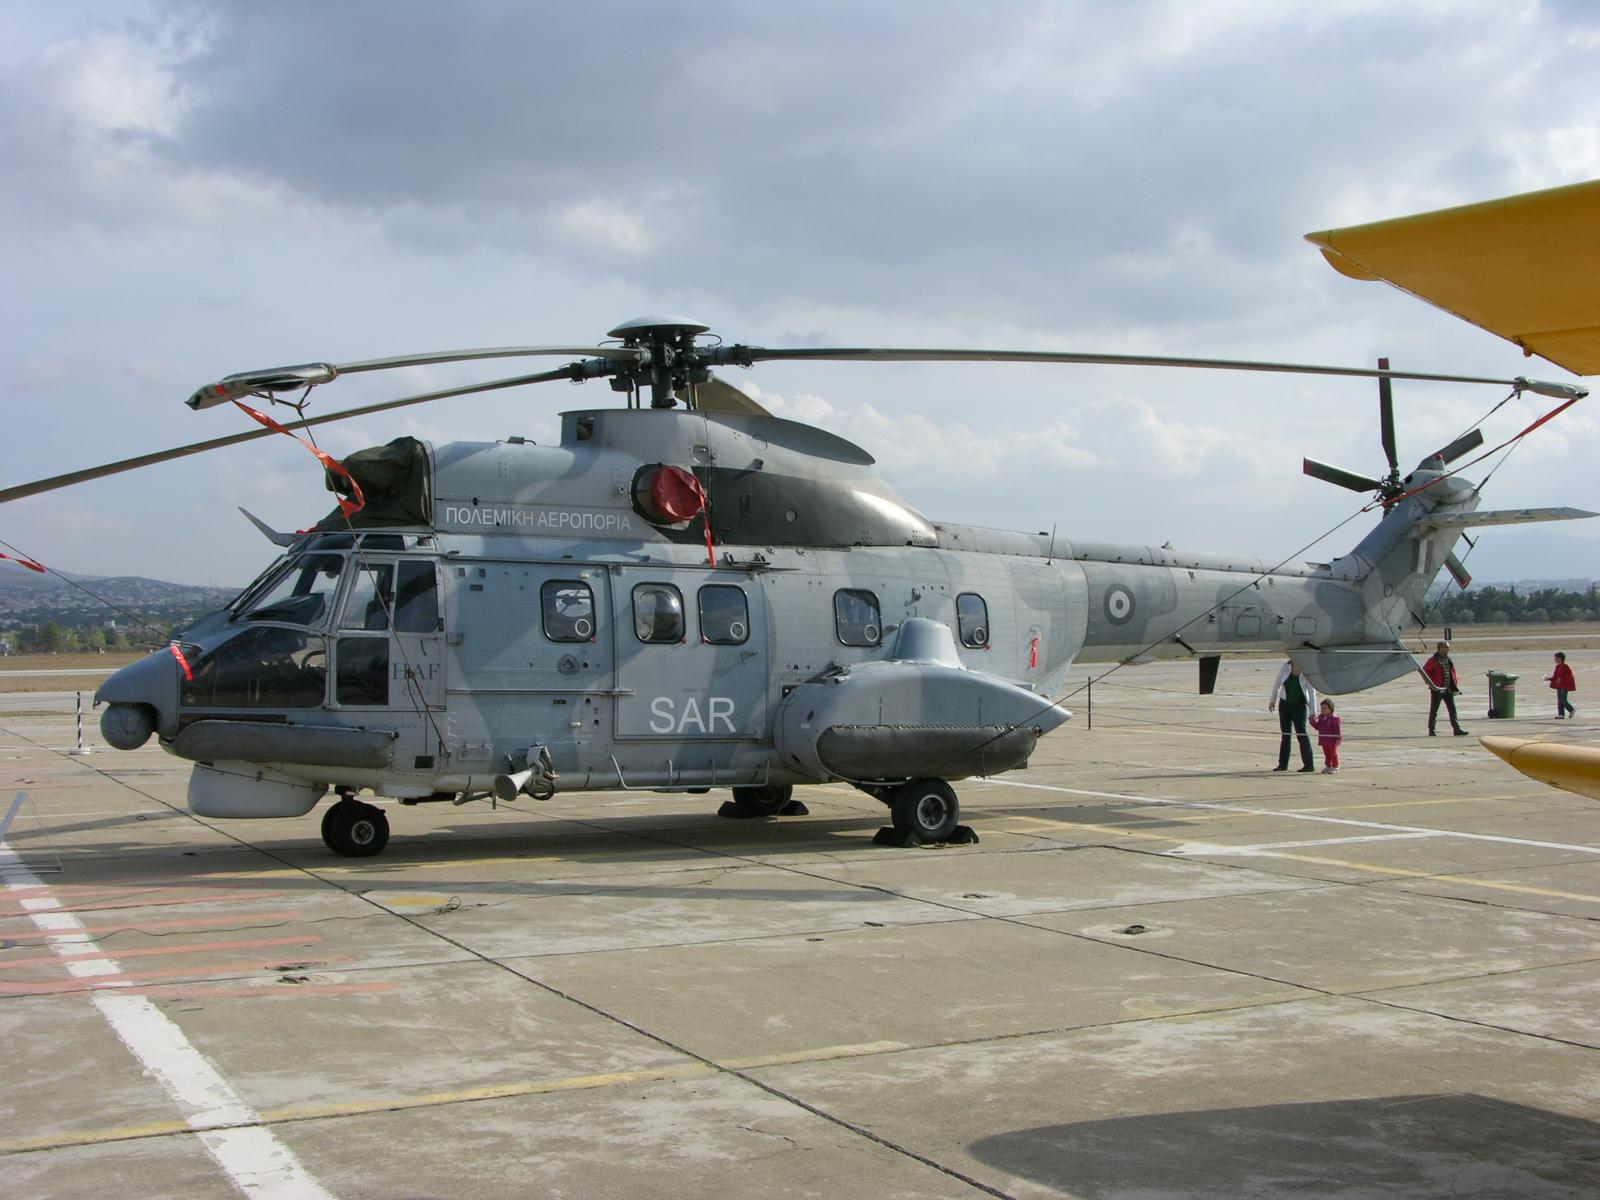 File:2574 Aerospatiale AS.3332C-1 Puma 358 MED, Tatoi-Dekelia